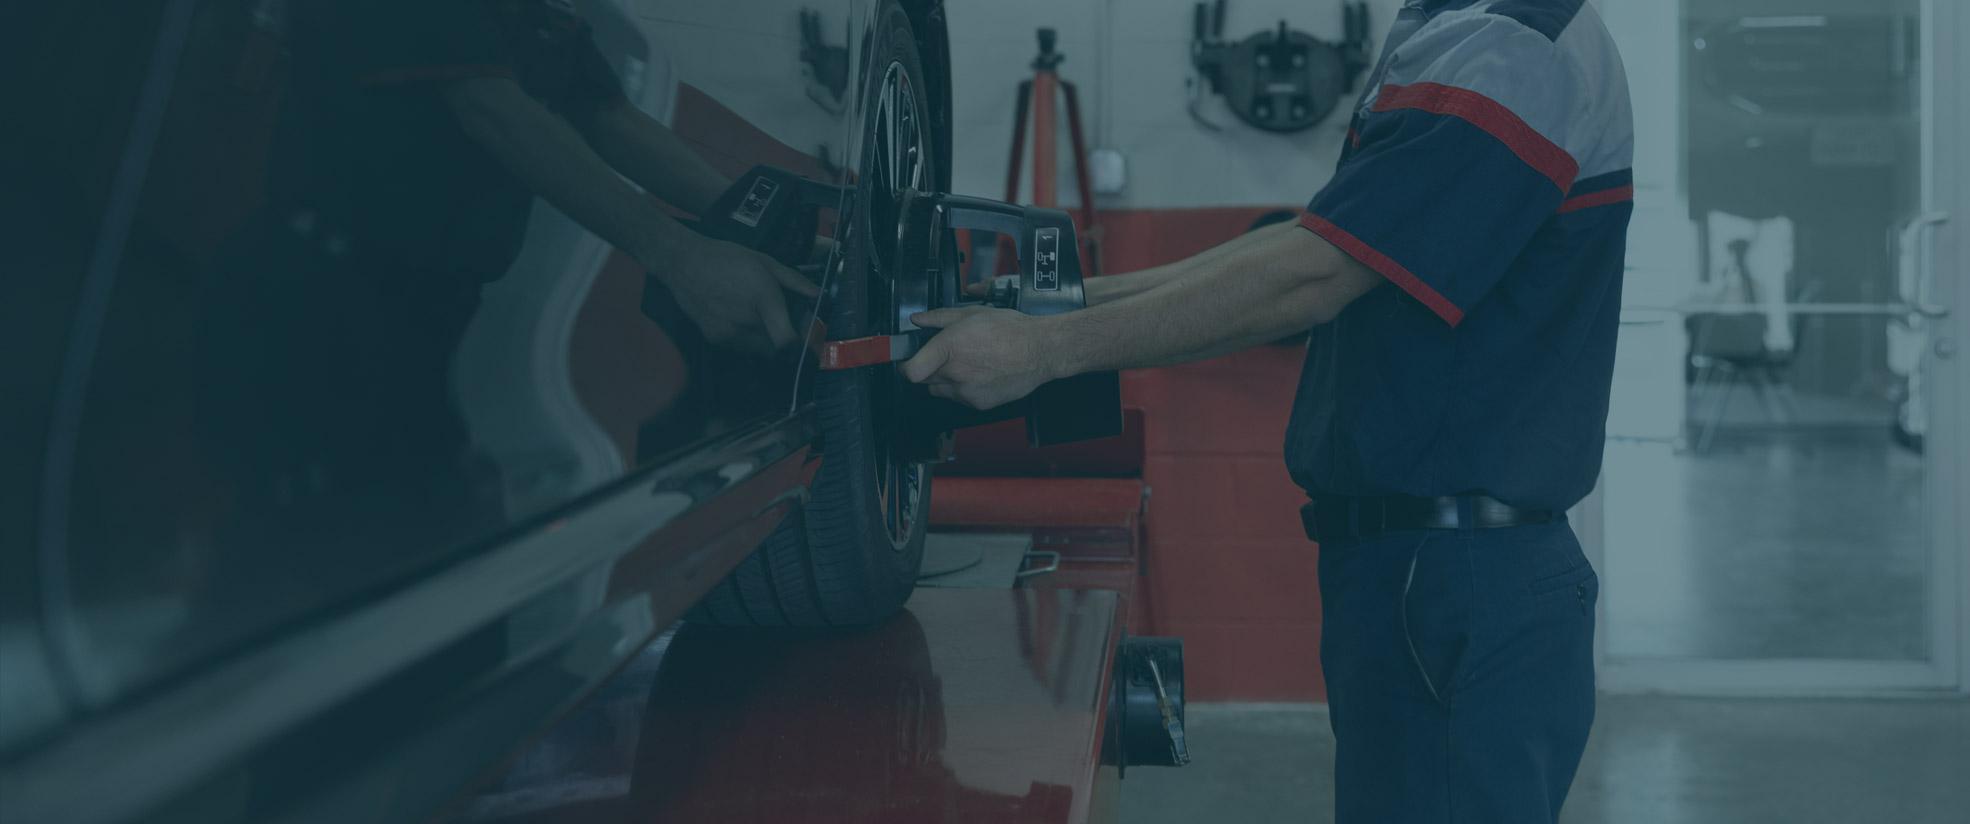 brakes plus employee working on car